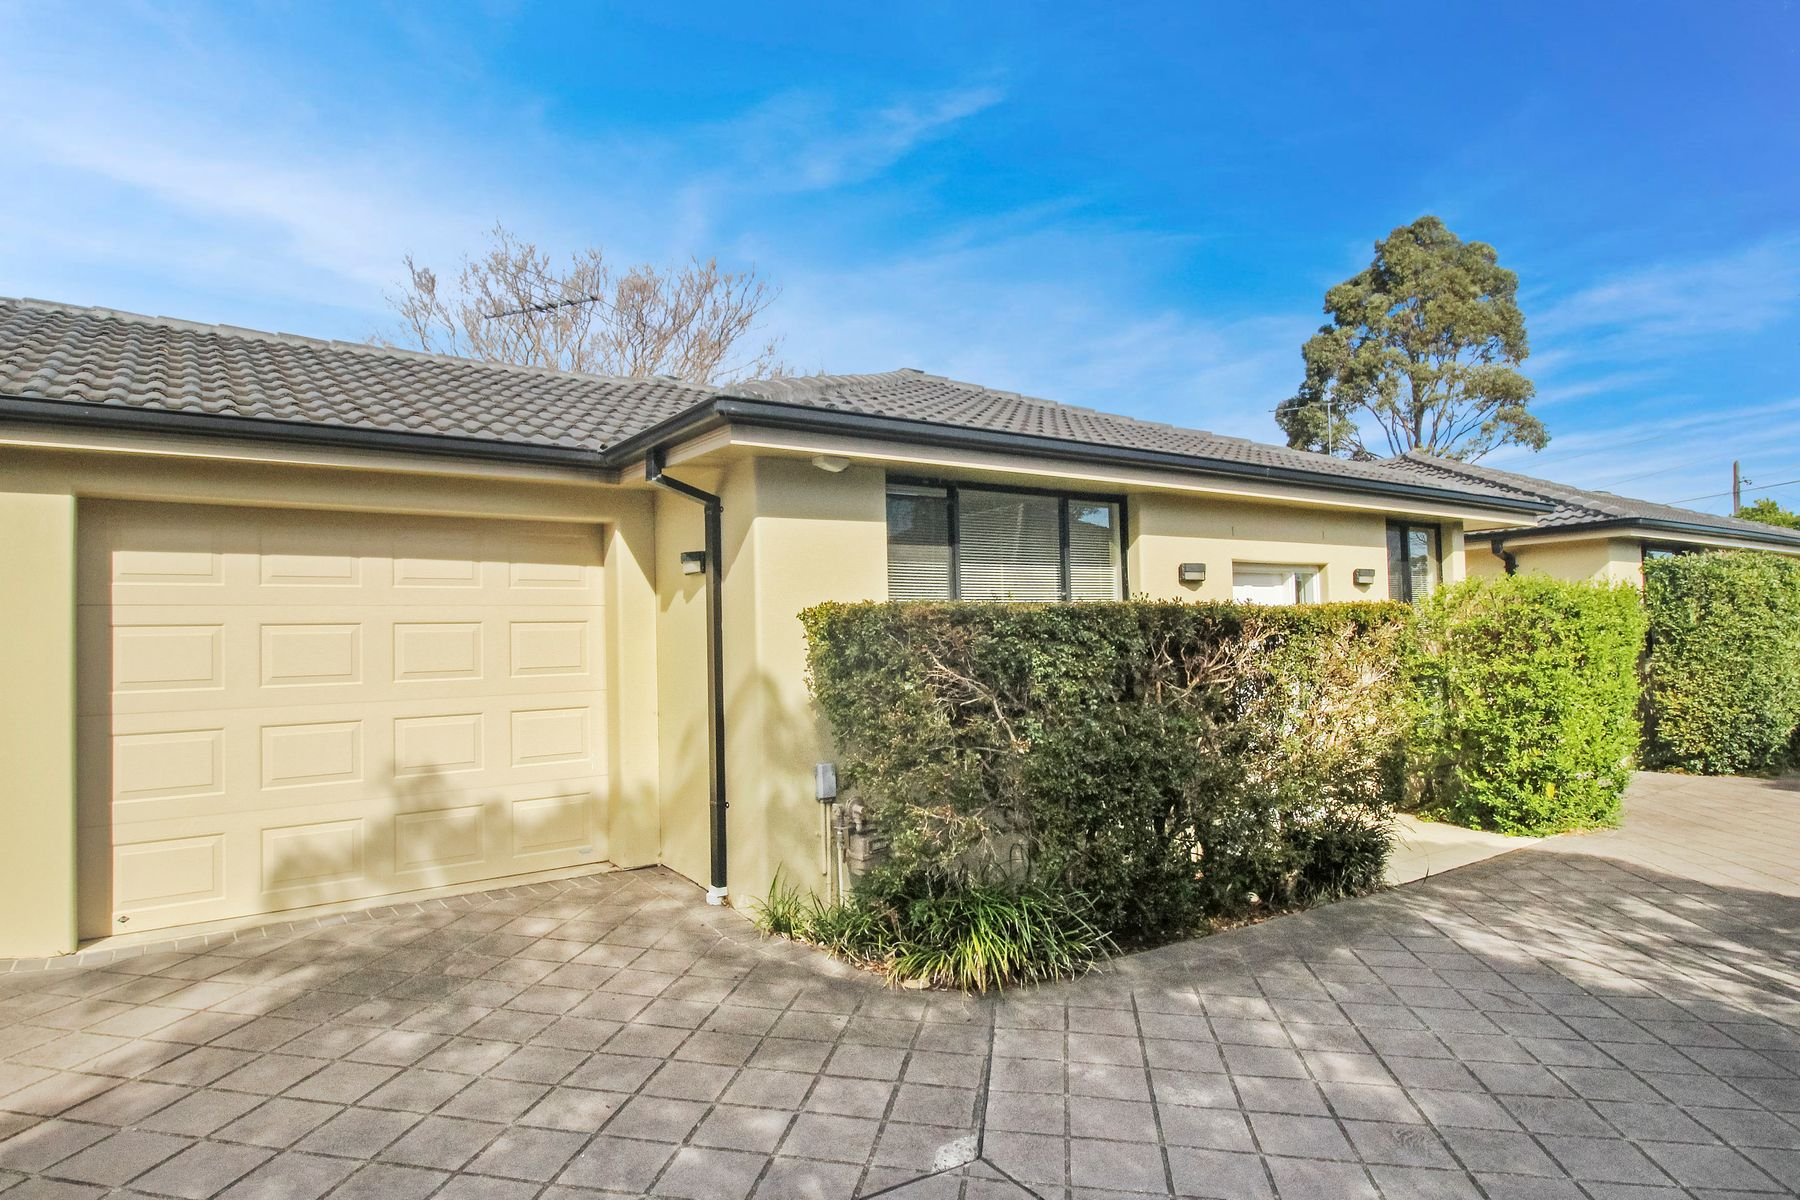 2/43 Trevitt Road, North Ryde, NSW 2113